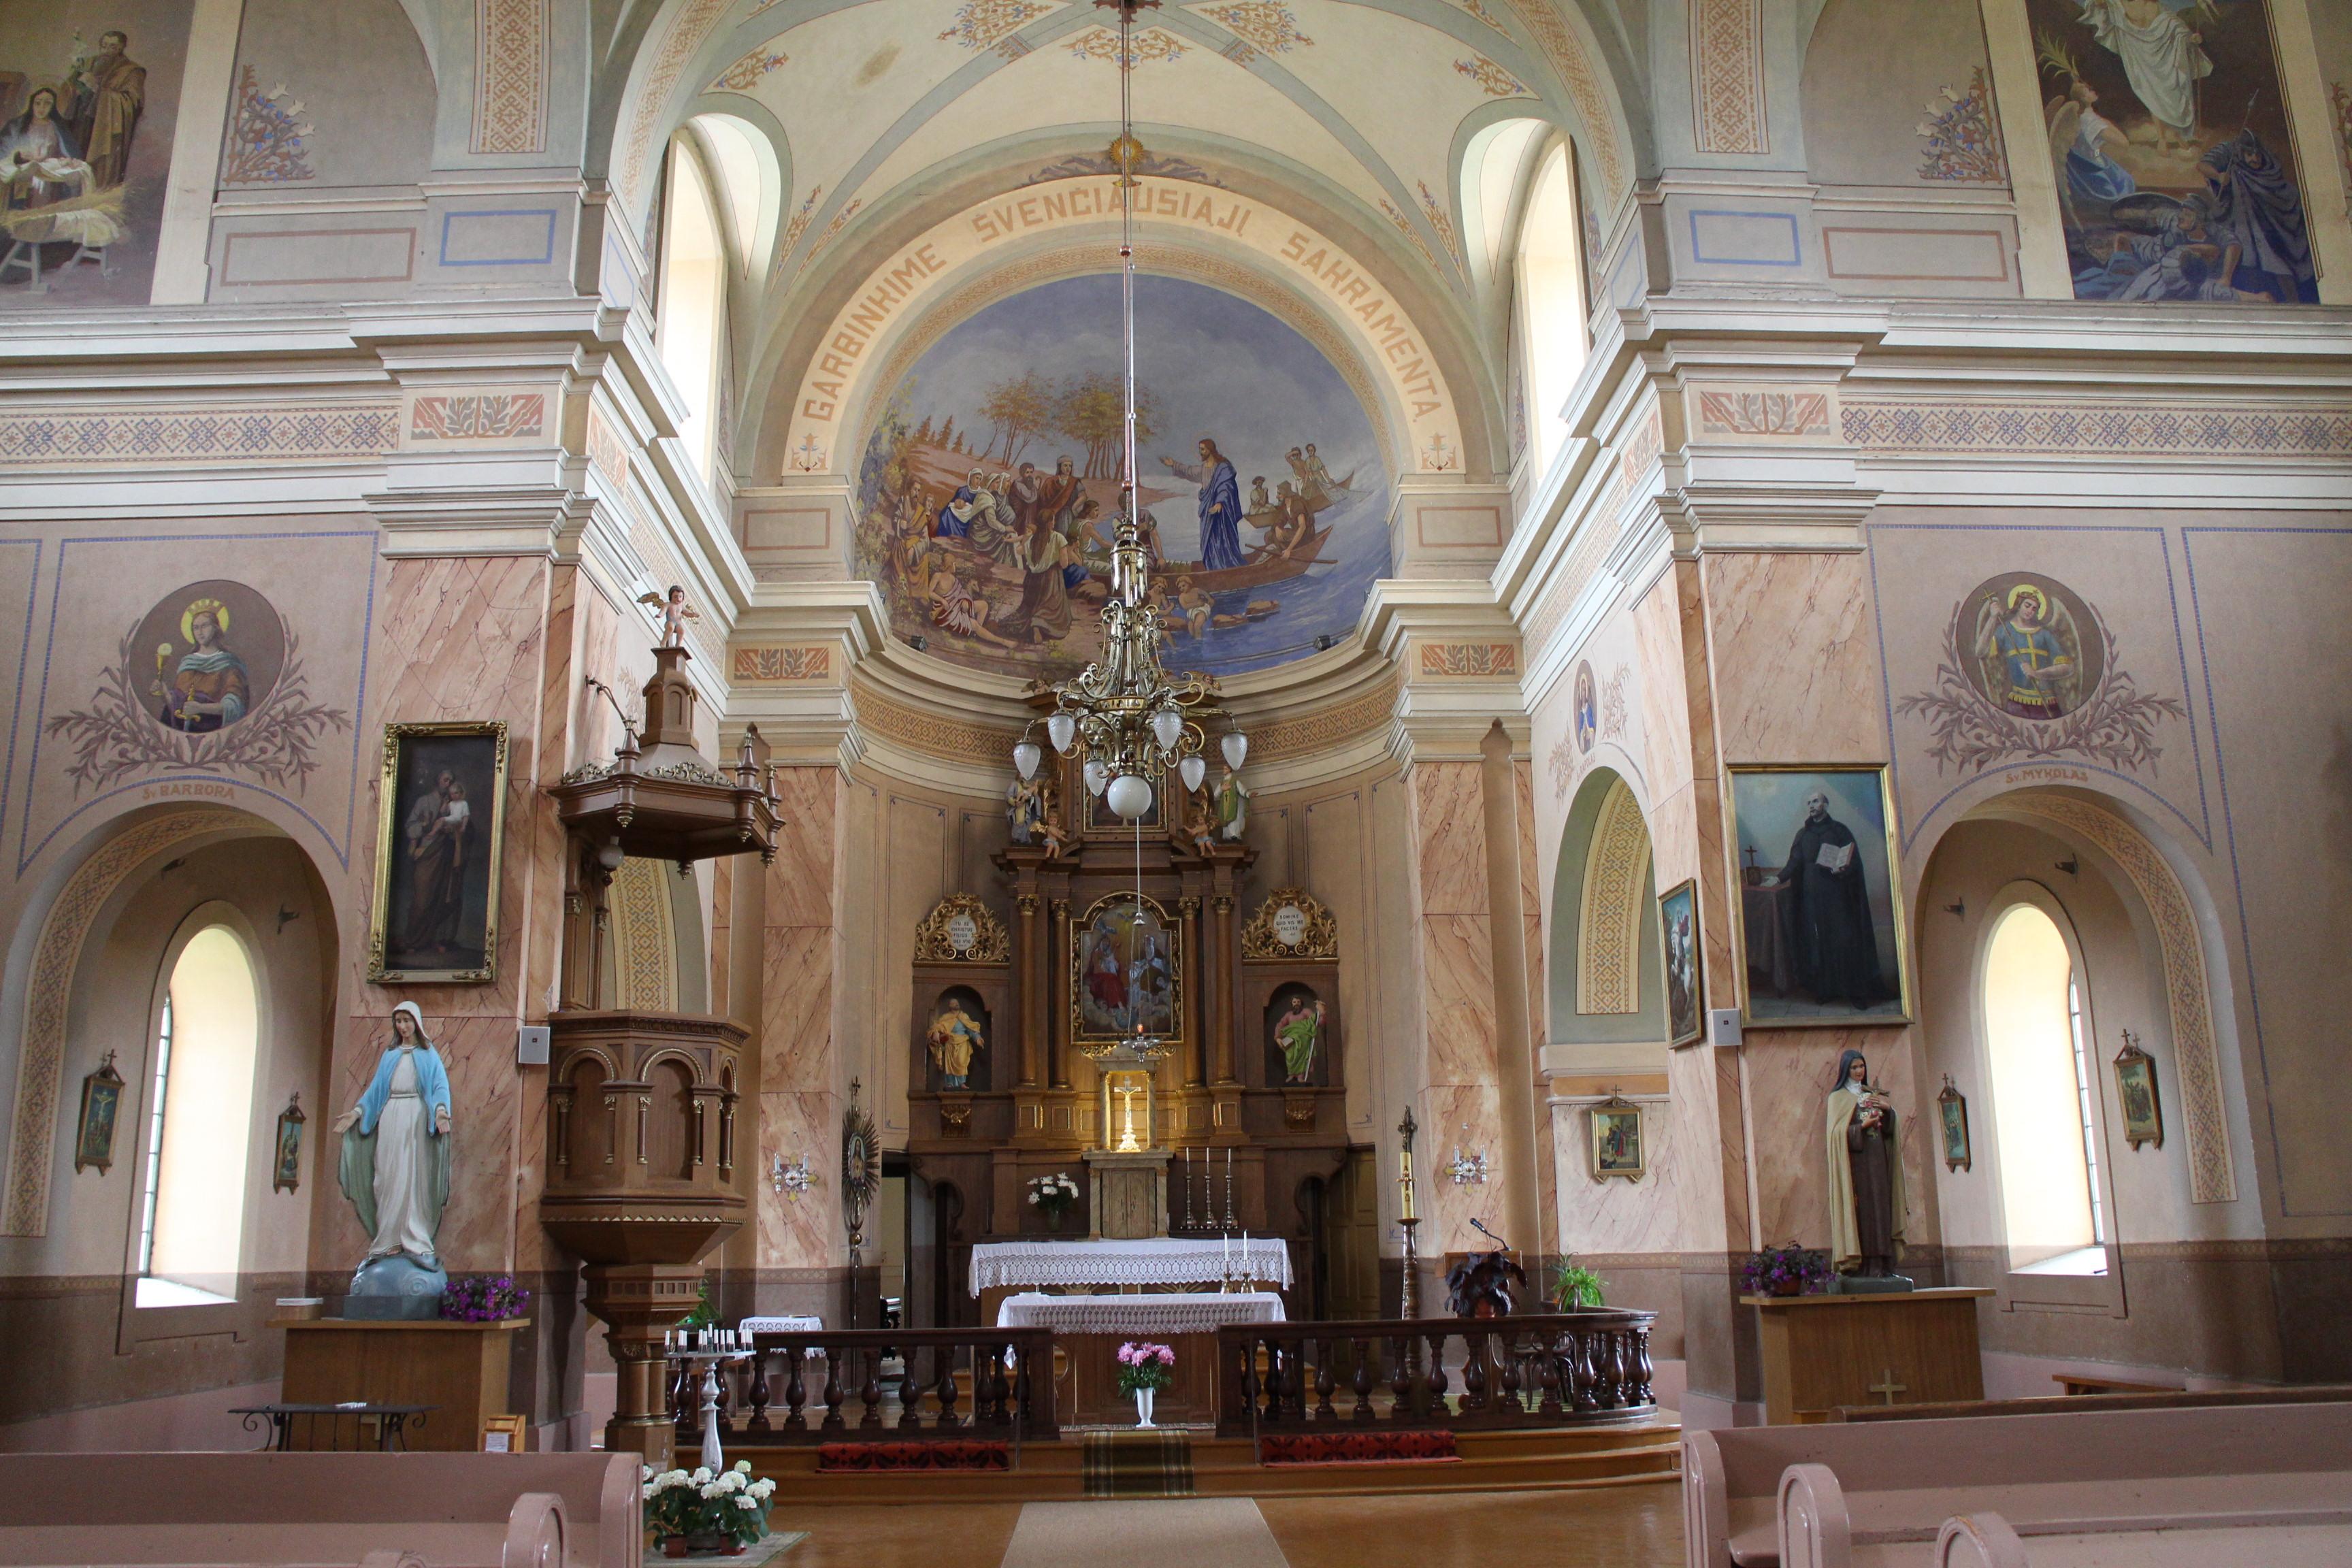 Bažnyčia, vos netapusi sandėliu